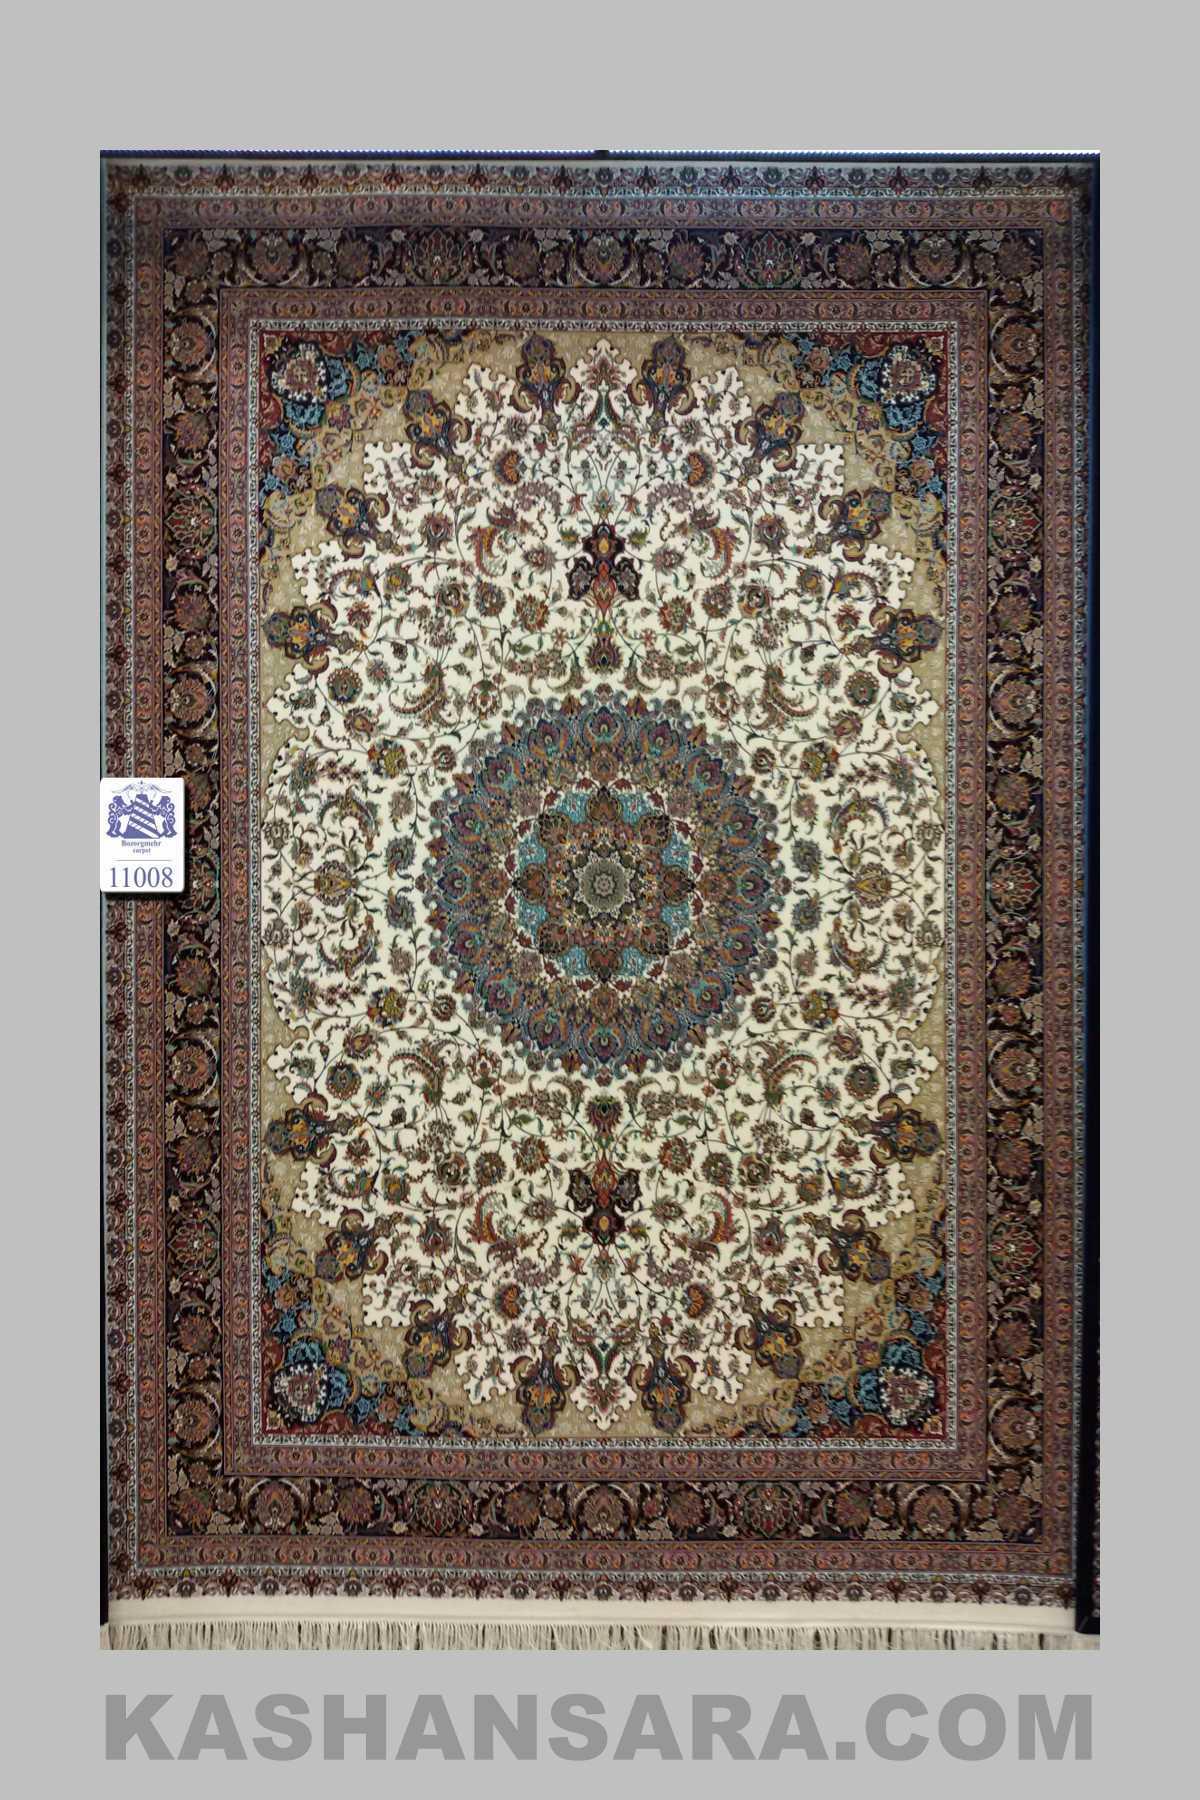 فرش ۱۰۰۰ شانه کاشان نقشه اصفهان